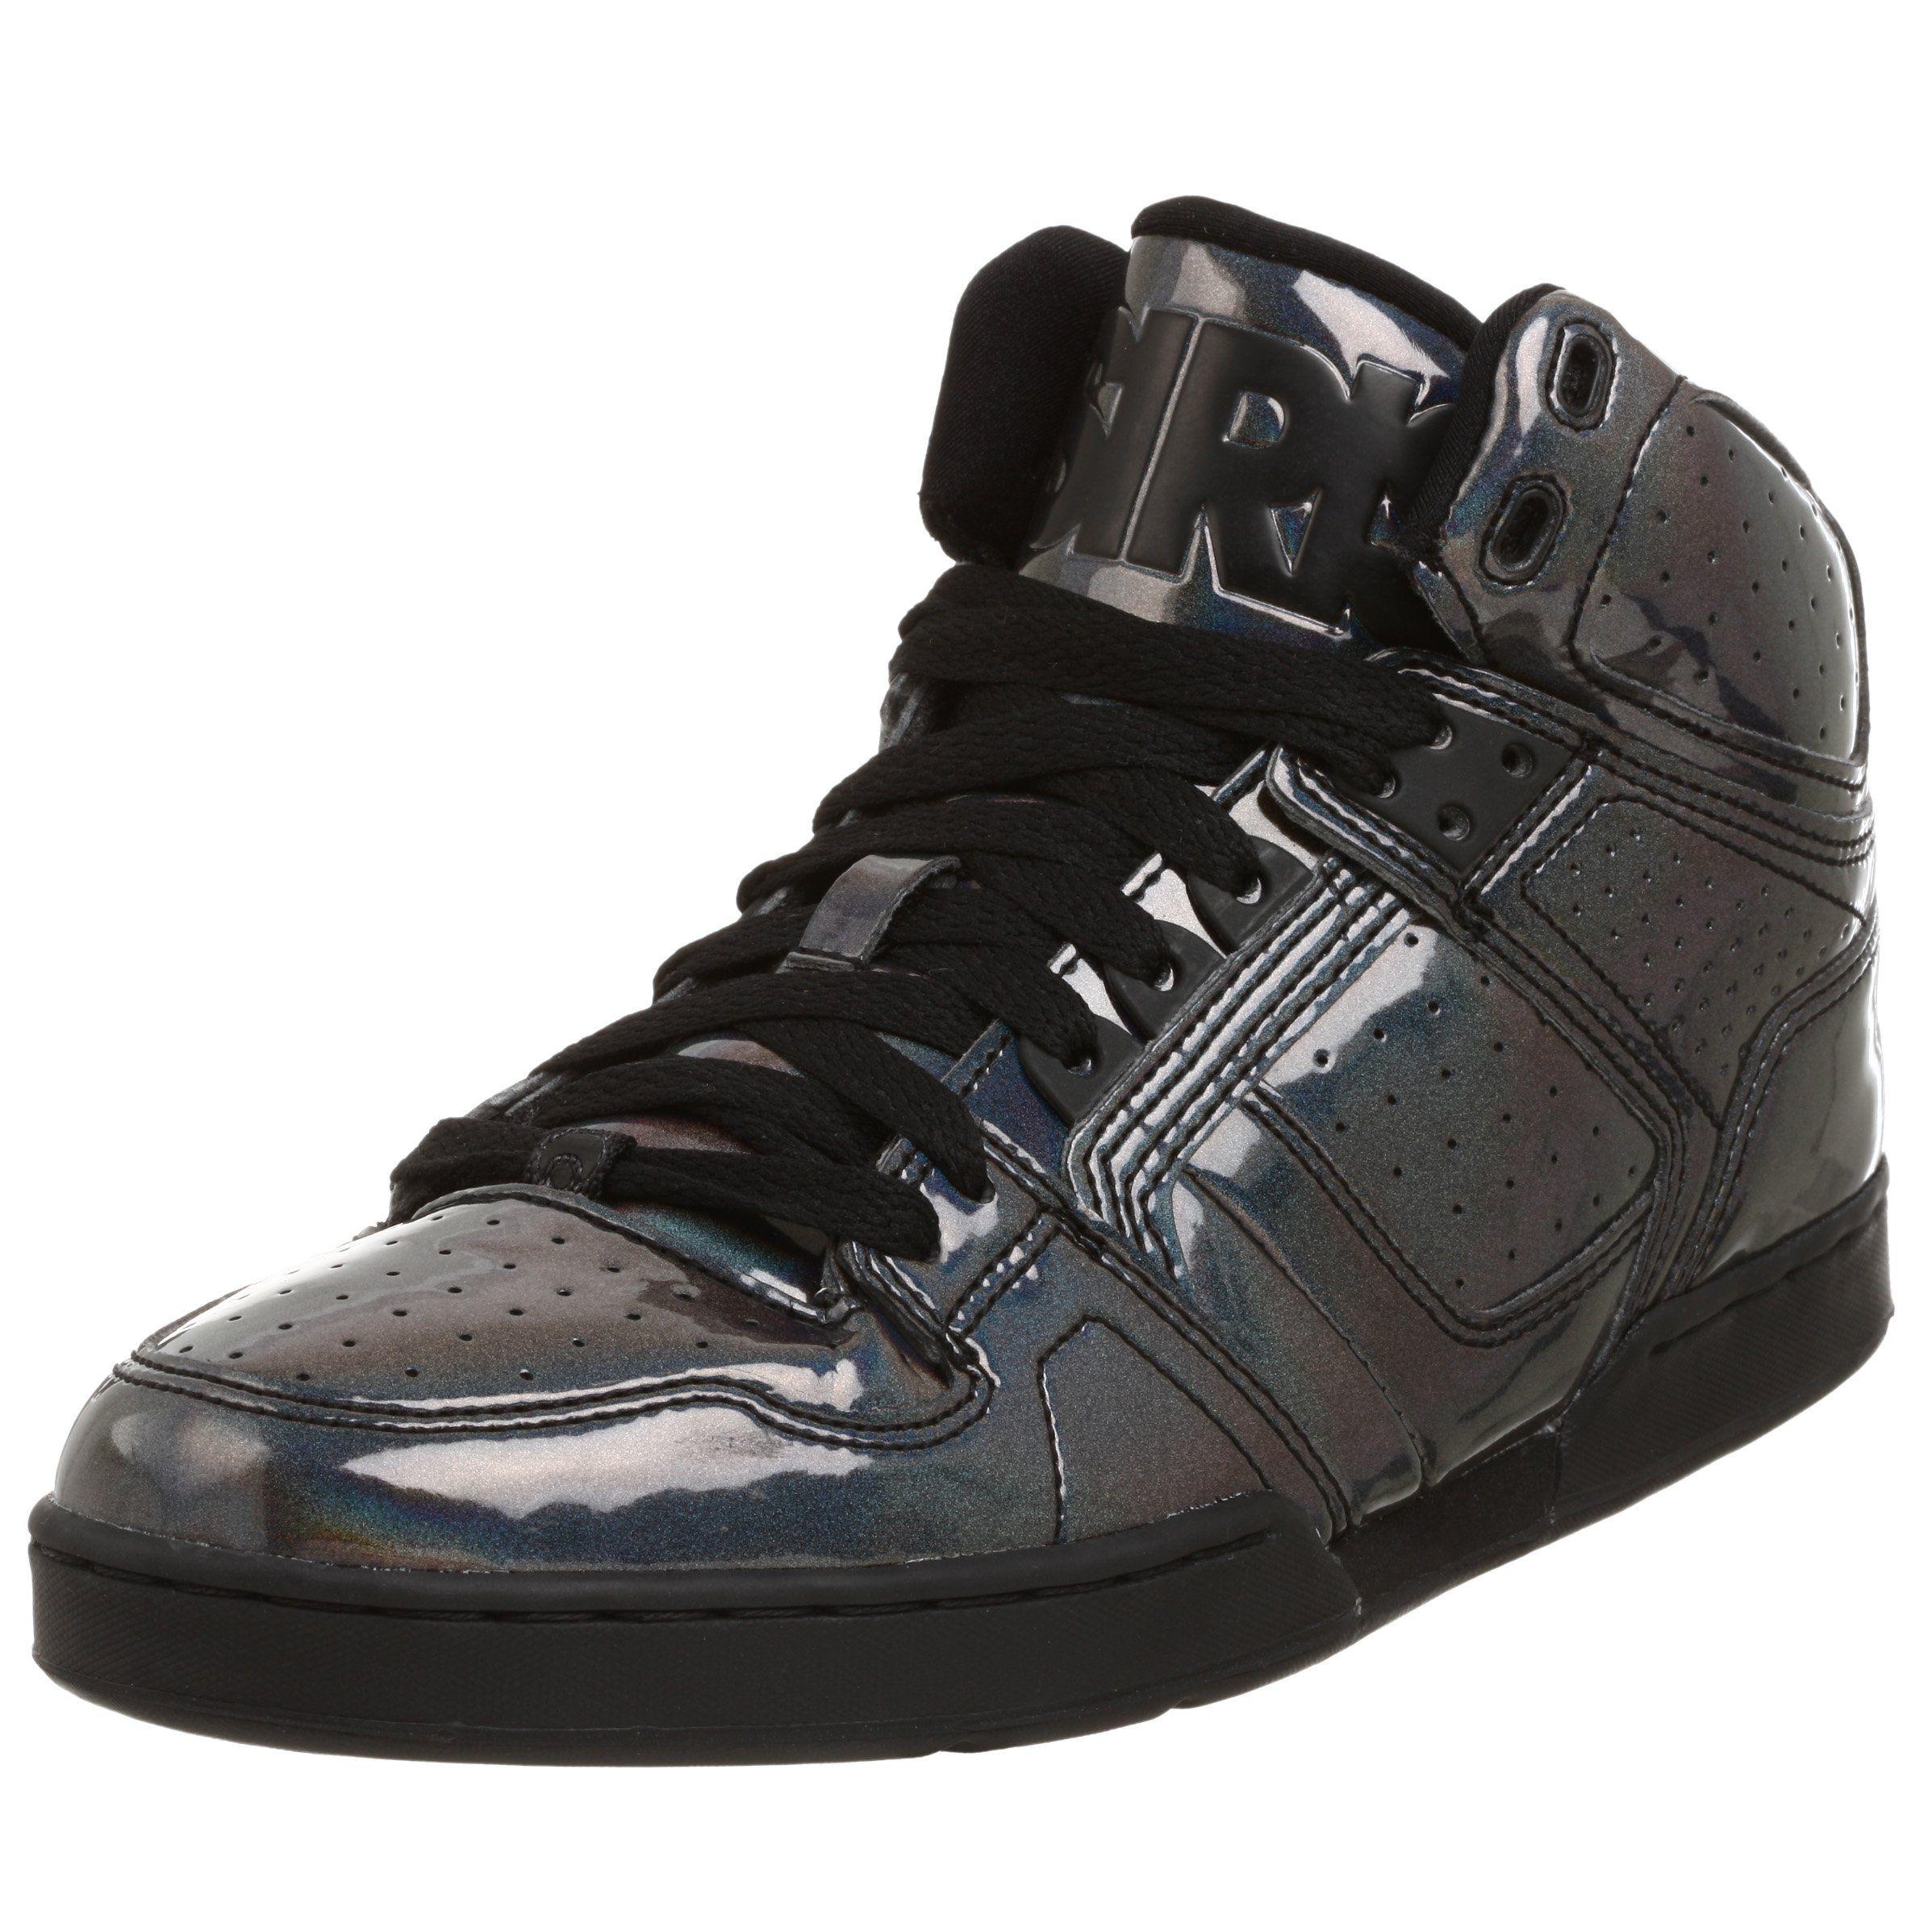 7b251436b79c3 Amazon.com: Osiris Men's Bronx Lifestyle Shoe: OSIRIS: Shoes | Cute ...